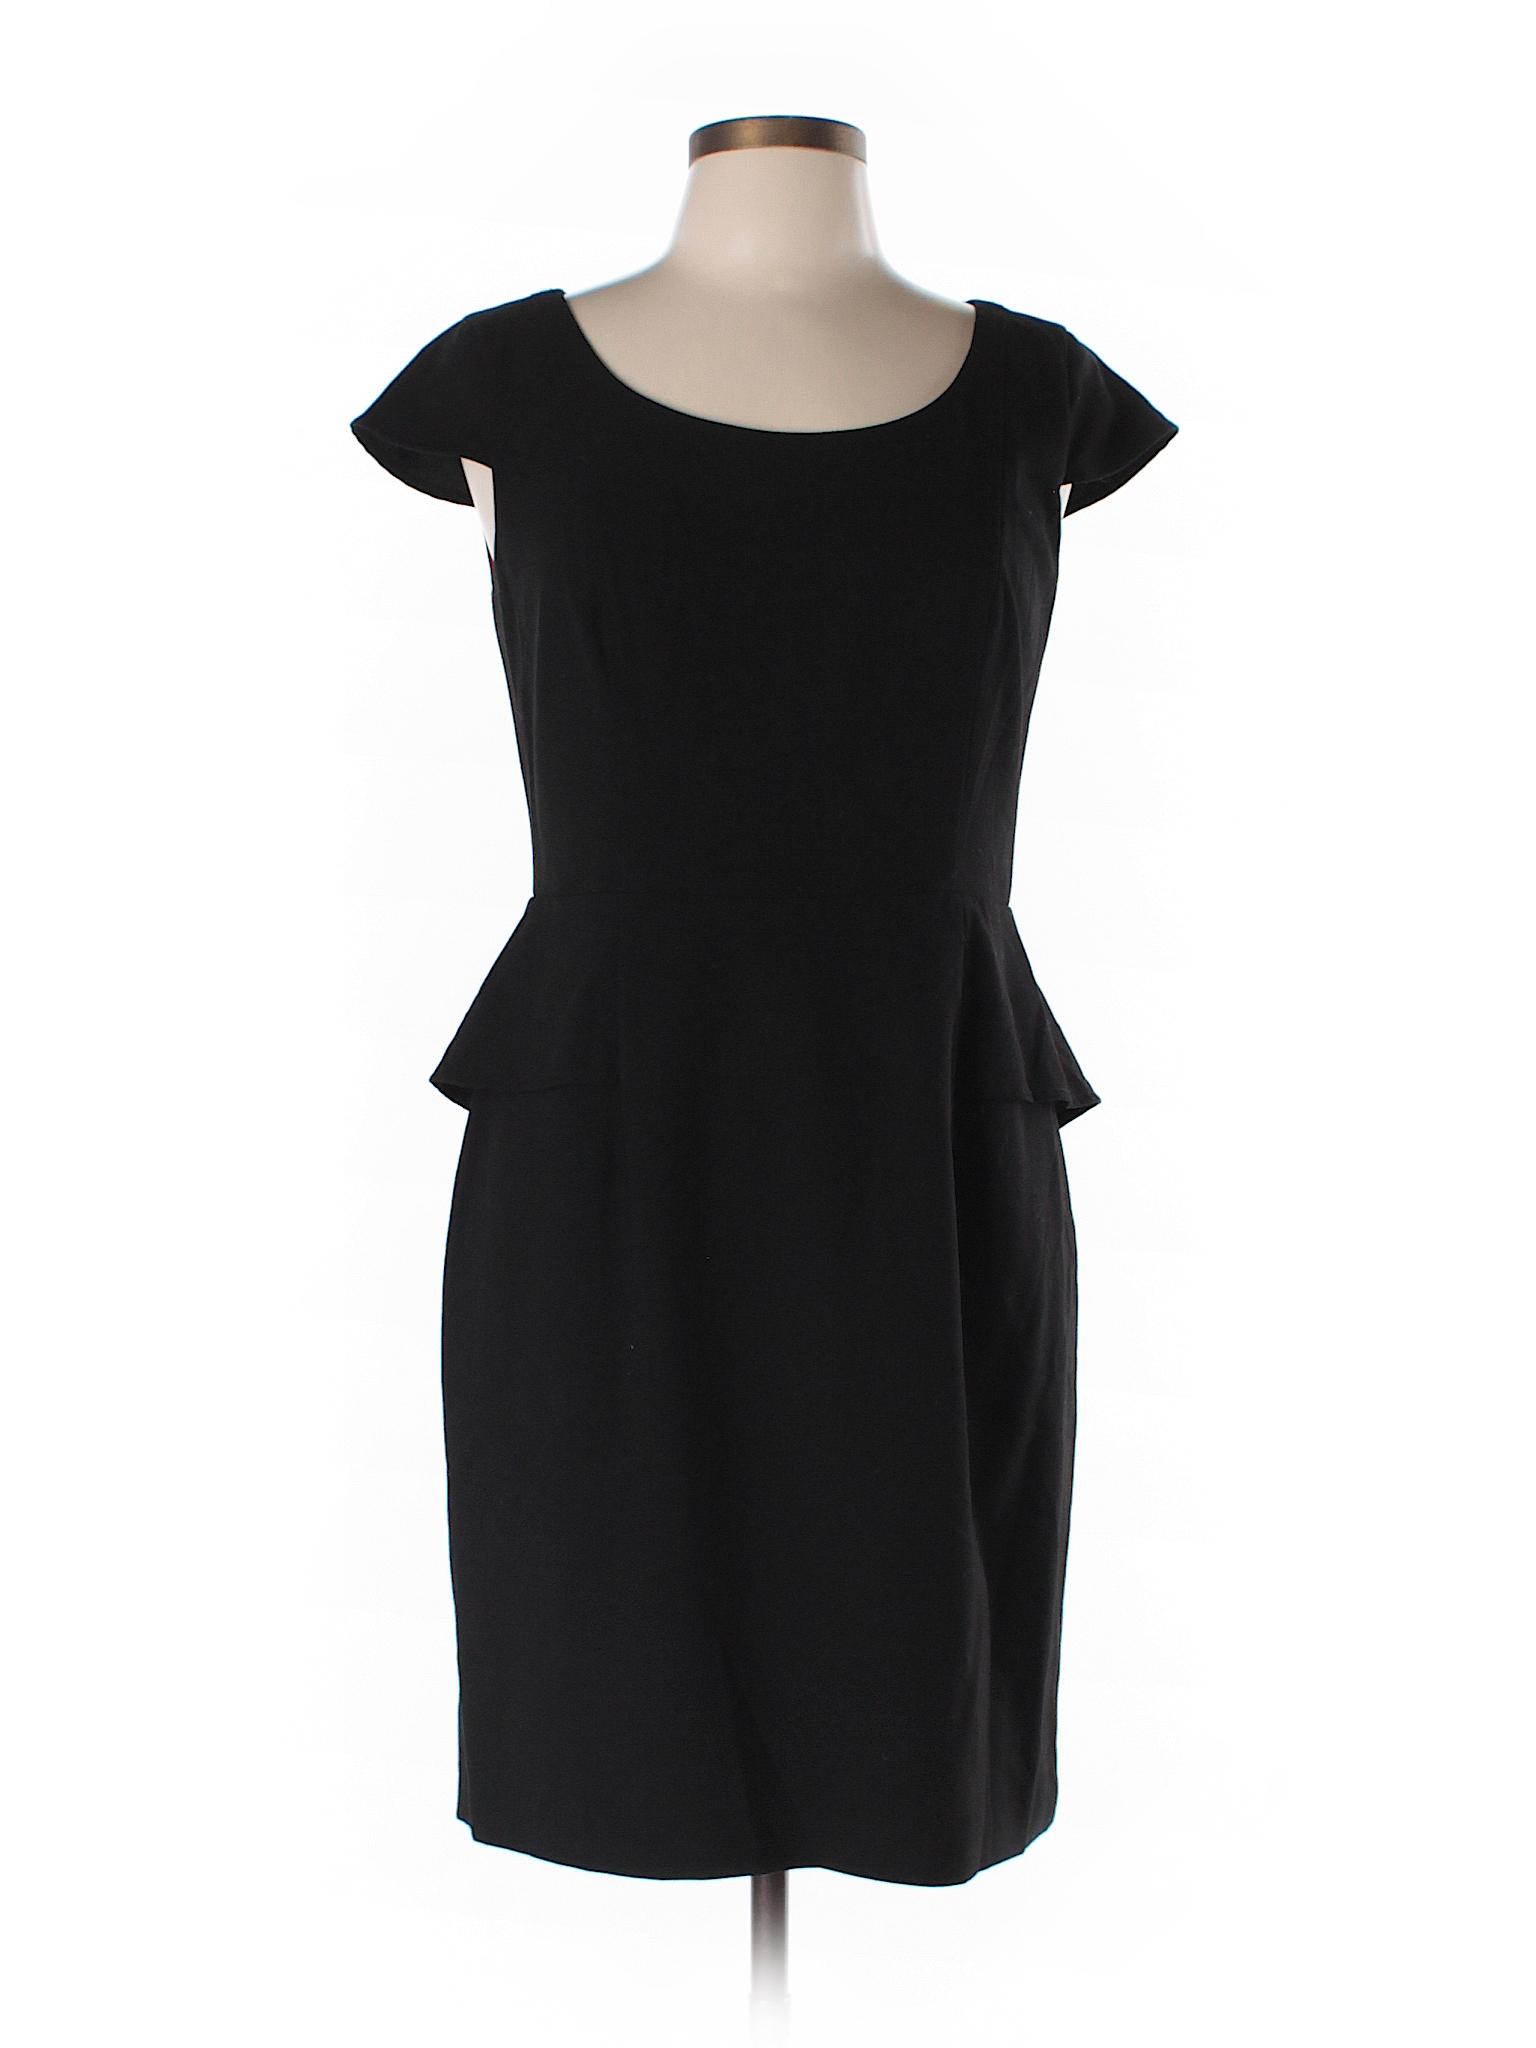 Dress Casual Marc York New Selling 6wqP74Tg4I